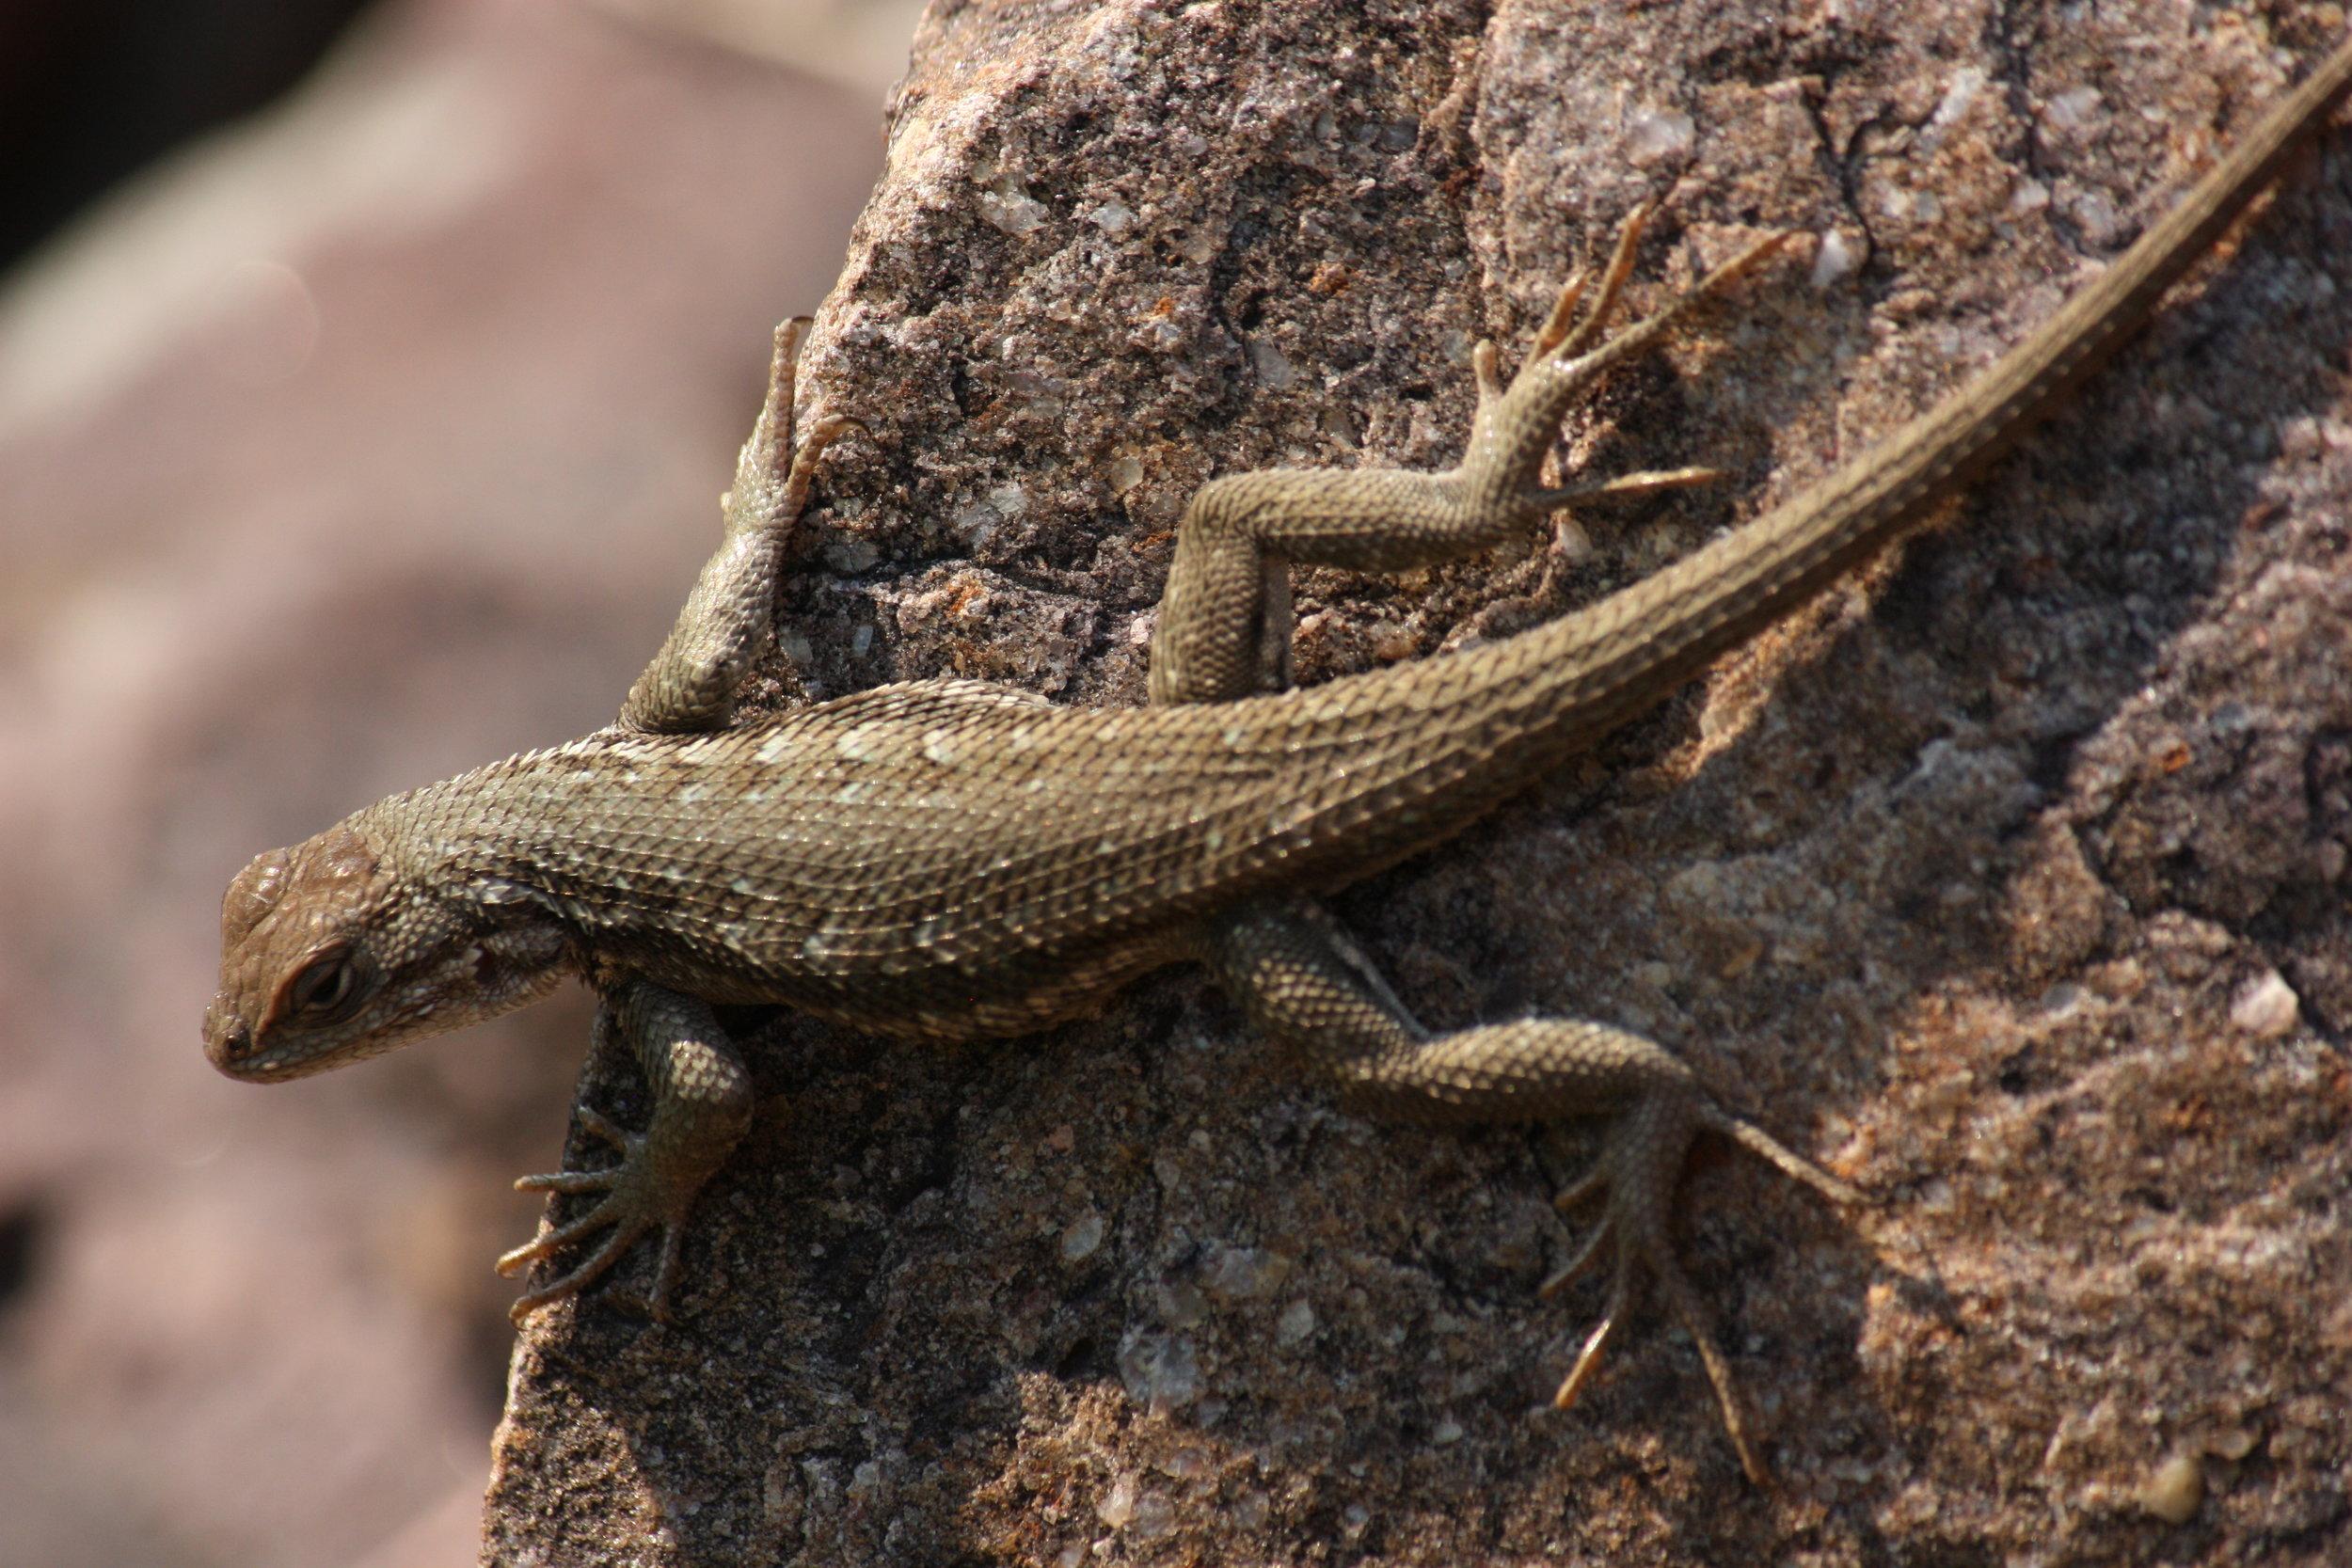 western-fence-lizard-sceloporus-occidentalis_25992385081_o.jpg